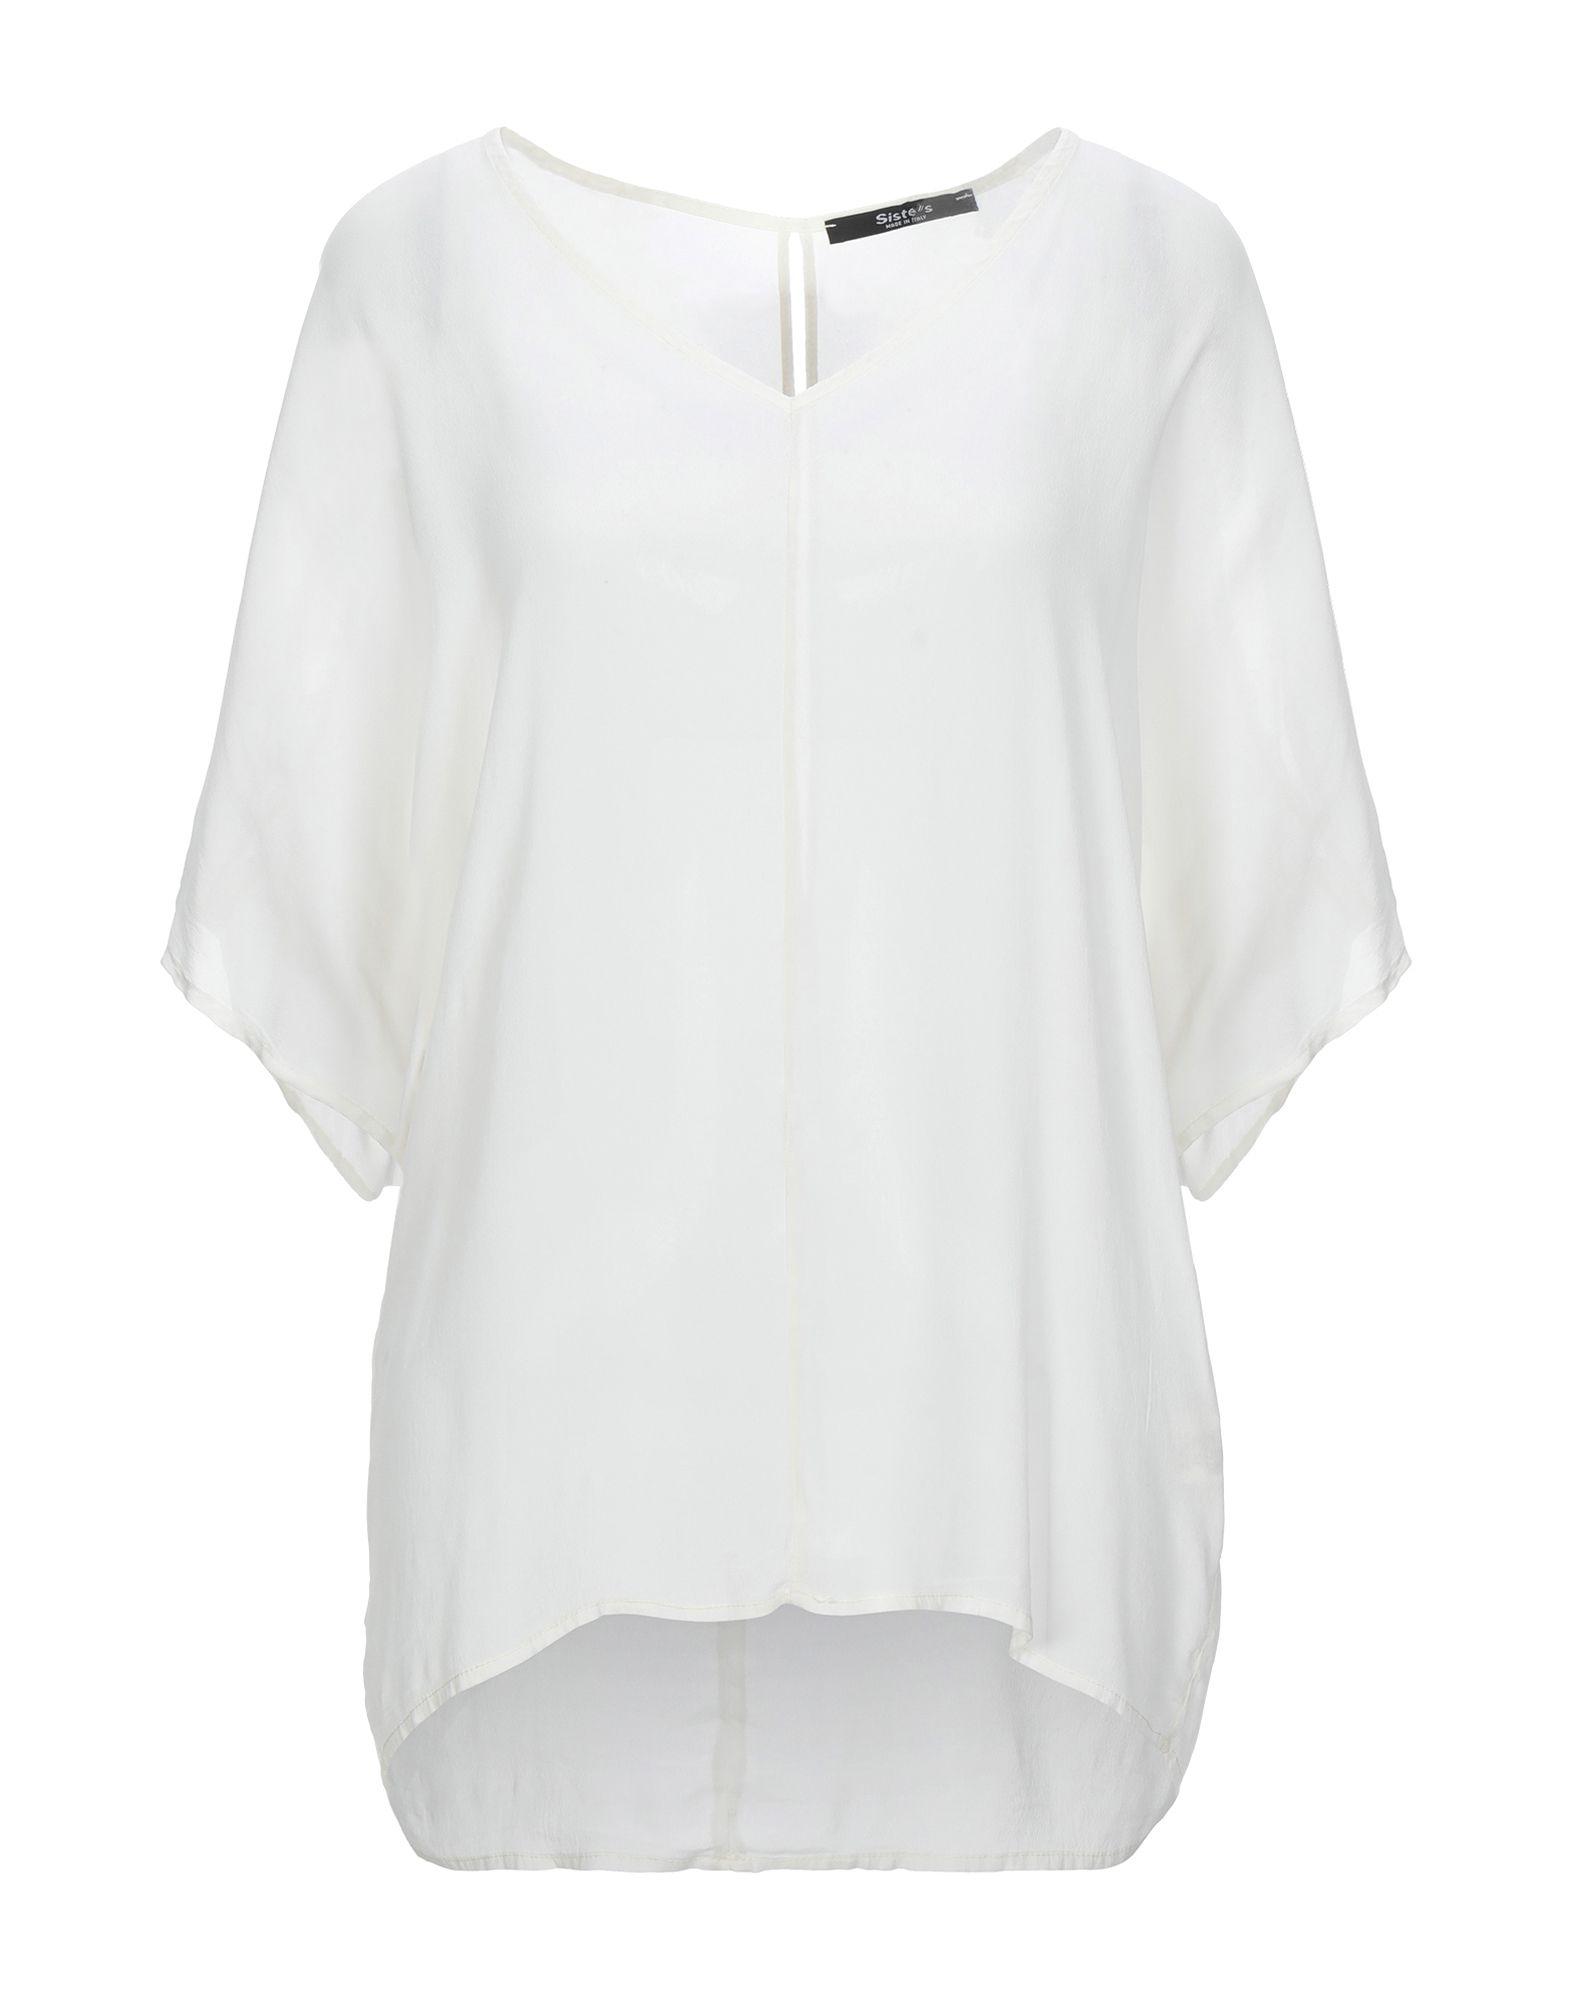 Фото - SISTE' S Блузка henry cotton s блузка